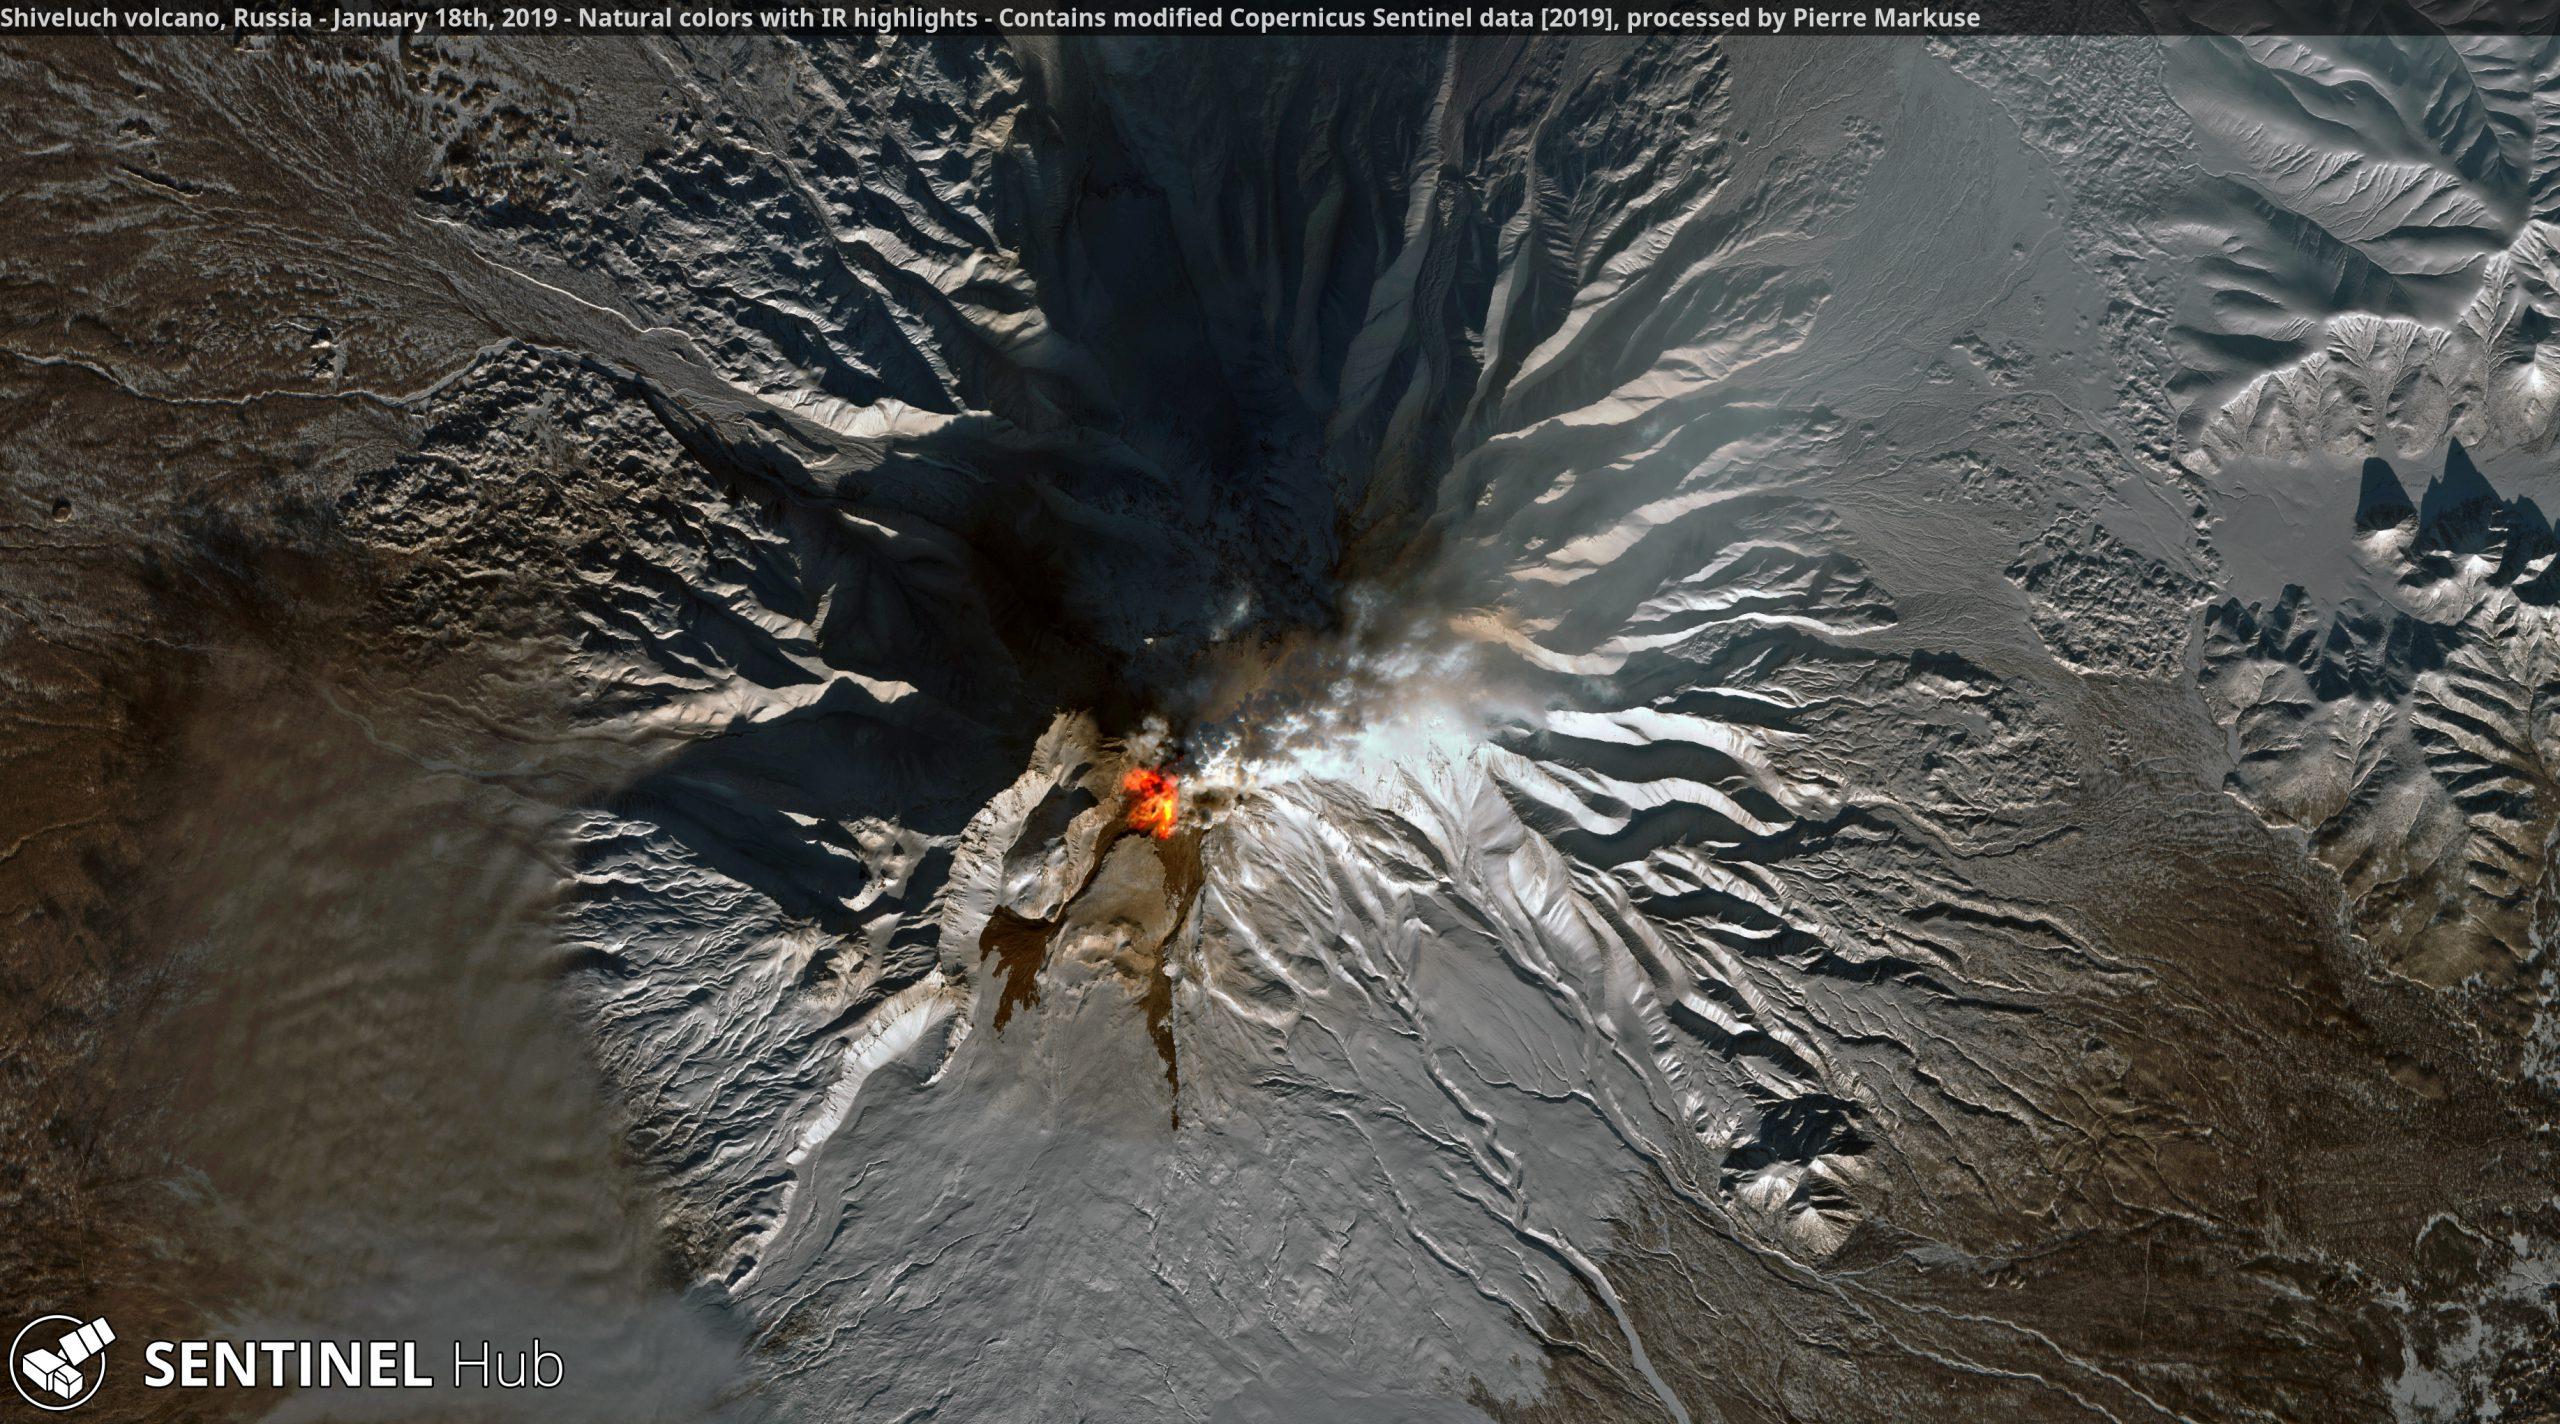 Shiveluch Volcano, Copernicus/Pierre Markuse